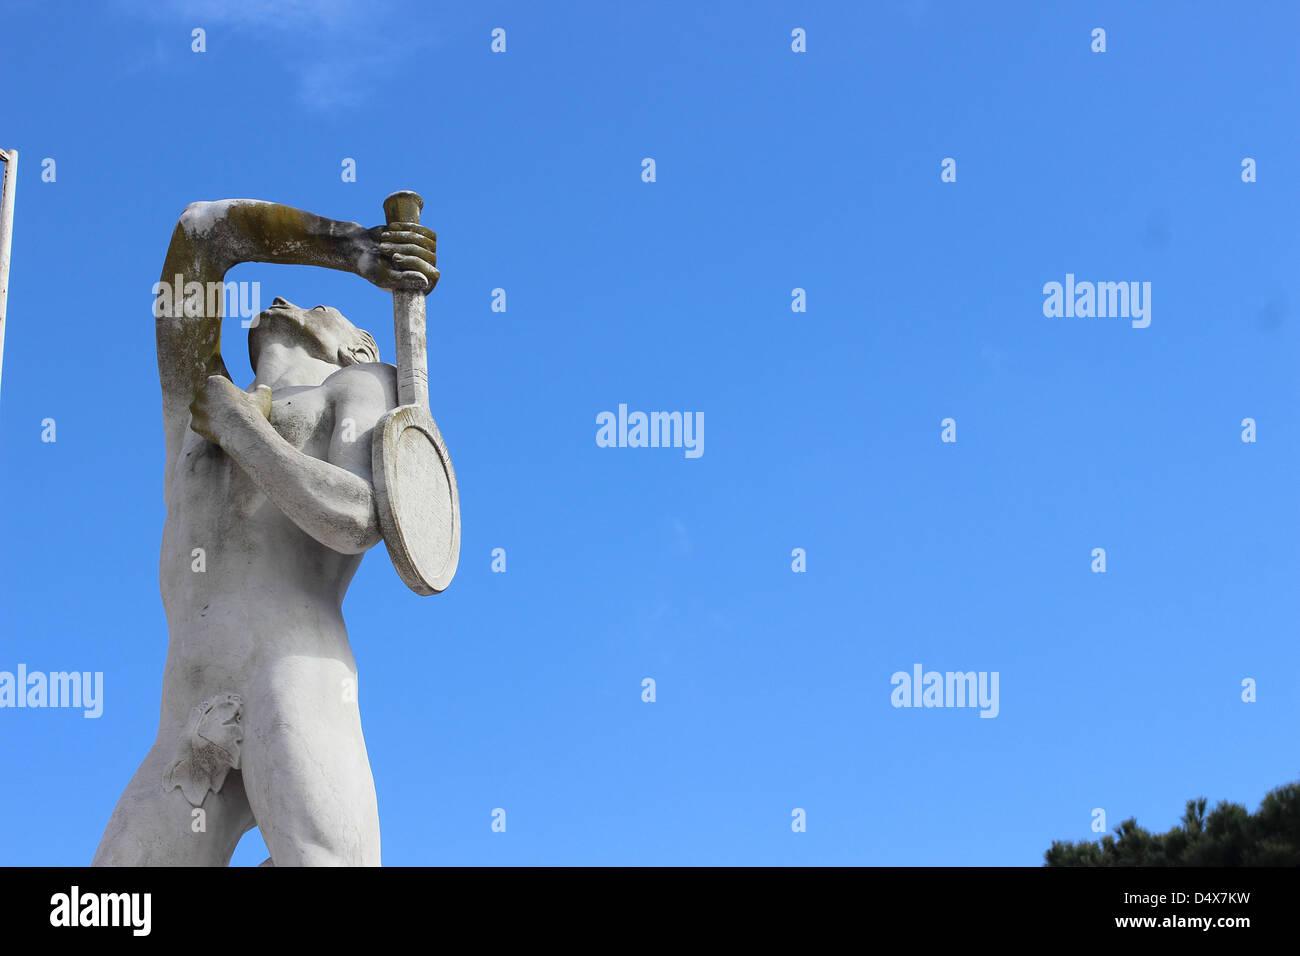 Olympic sport statue Foro Italico - Rome - - Stock Image